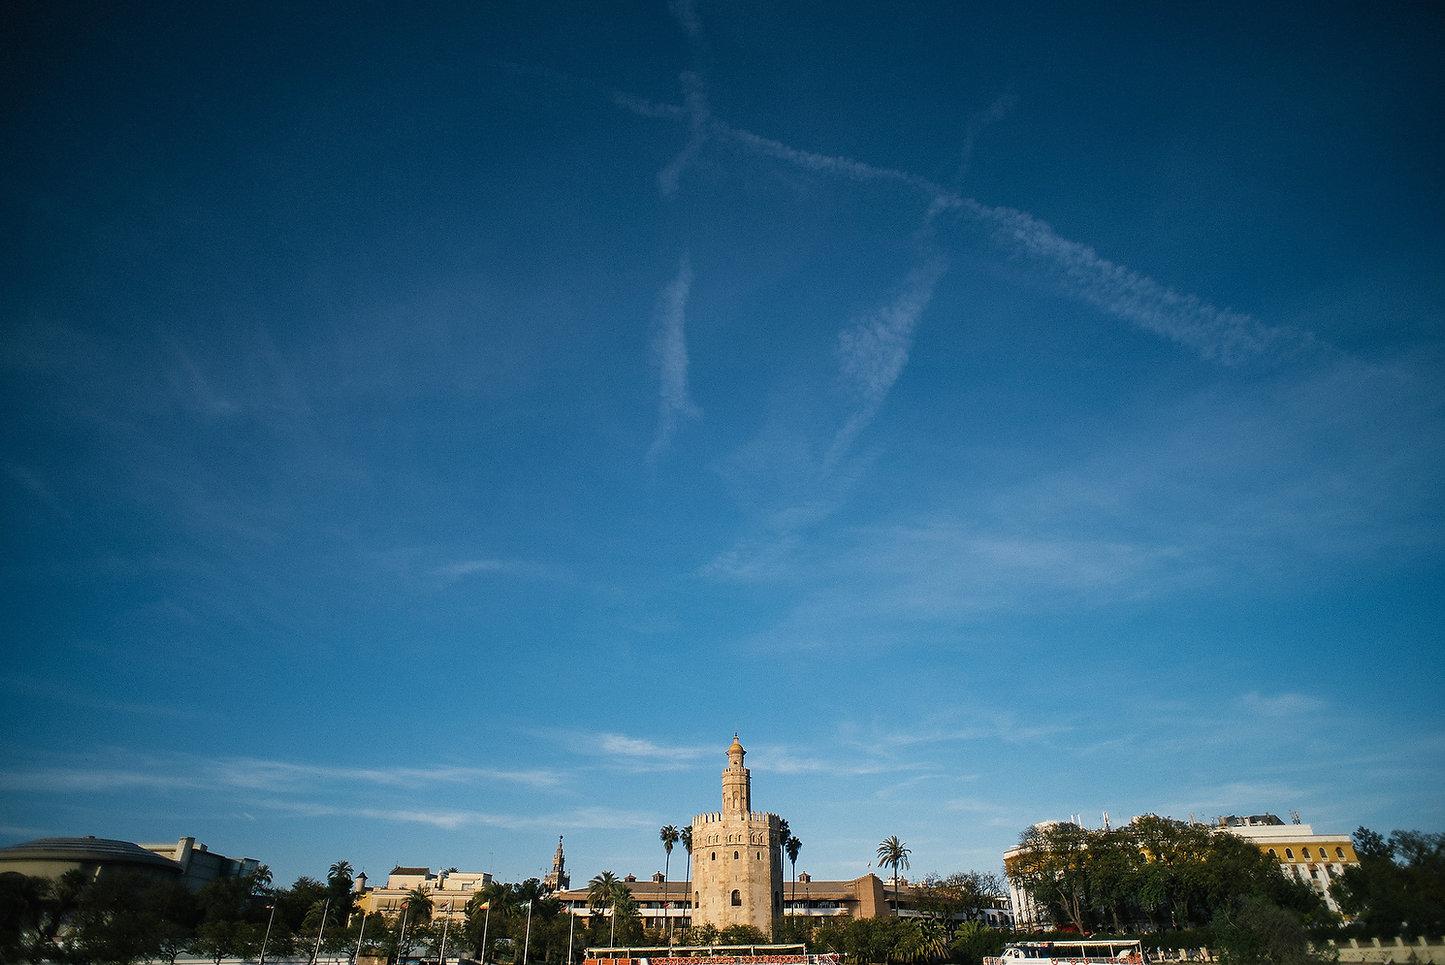 vista de la torre del oro sevilla